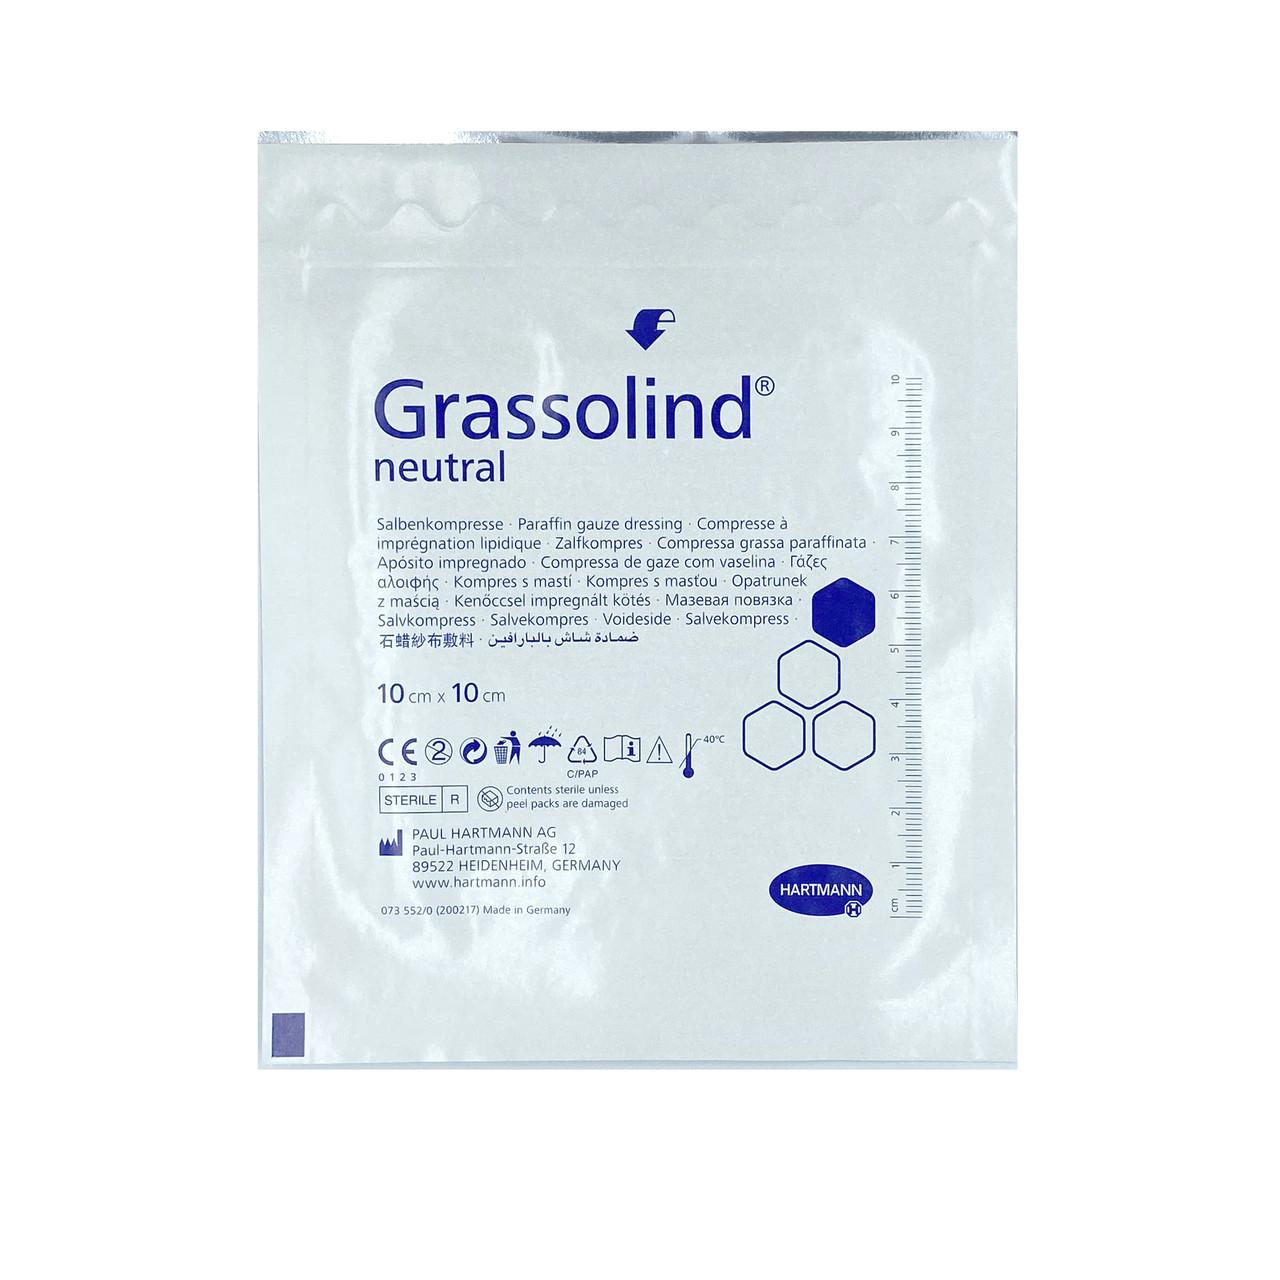 Grassolind Neutral / Гразолинд Нейтраль мазевая повязка стерильная, 10 Х 10 см